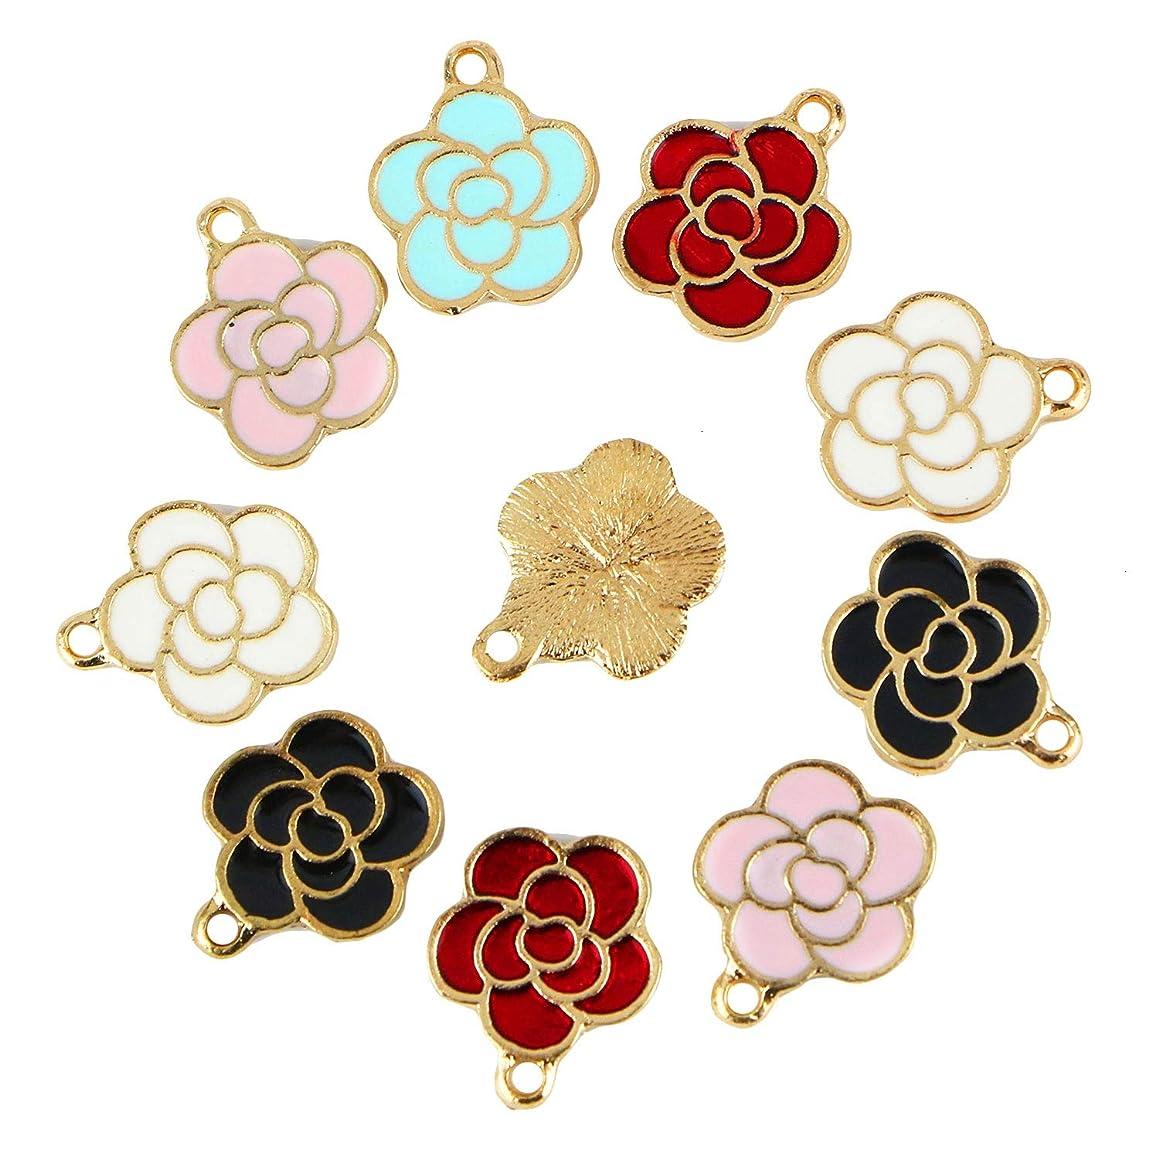 Monrocco 30Pcs Enamel Flower Charm Cute Enamel Rose Flowers Charm Bracelet Charms Pendants for Jewelry Making